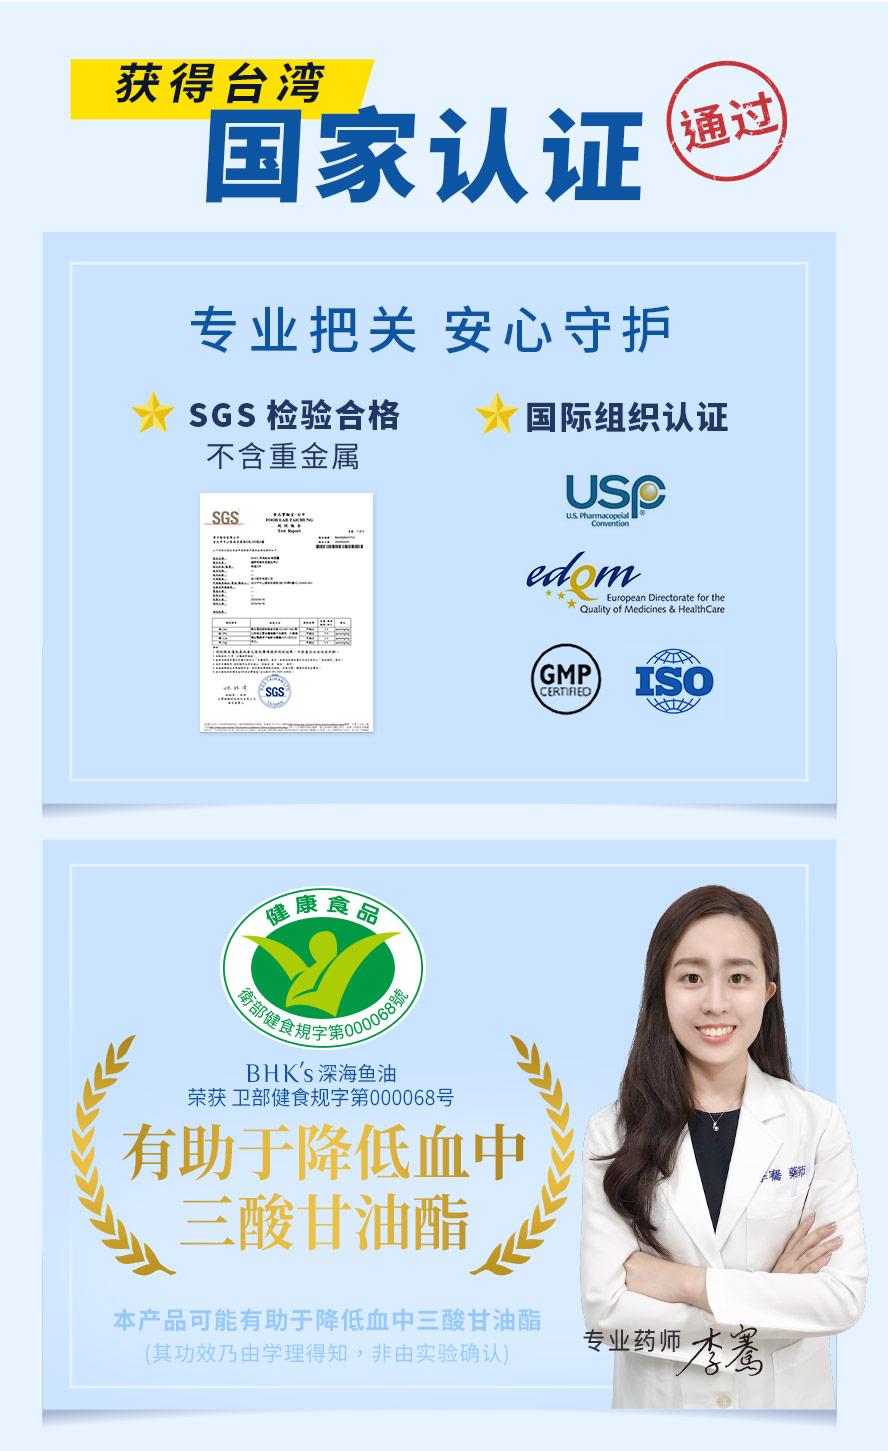 BHK's鱼油软胶囊的EPA:DHA为黄金比例30:20,是专业营养师和药师都推荐的好鱼油.